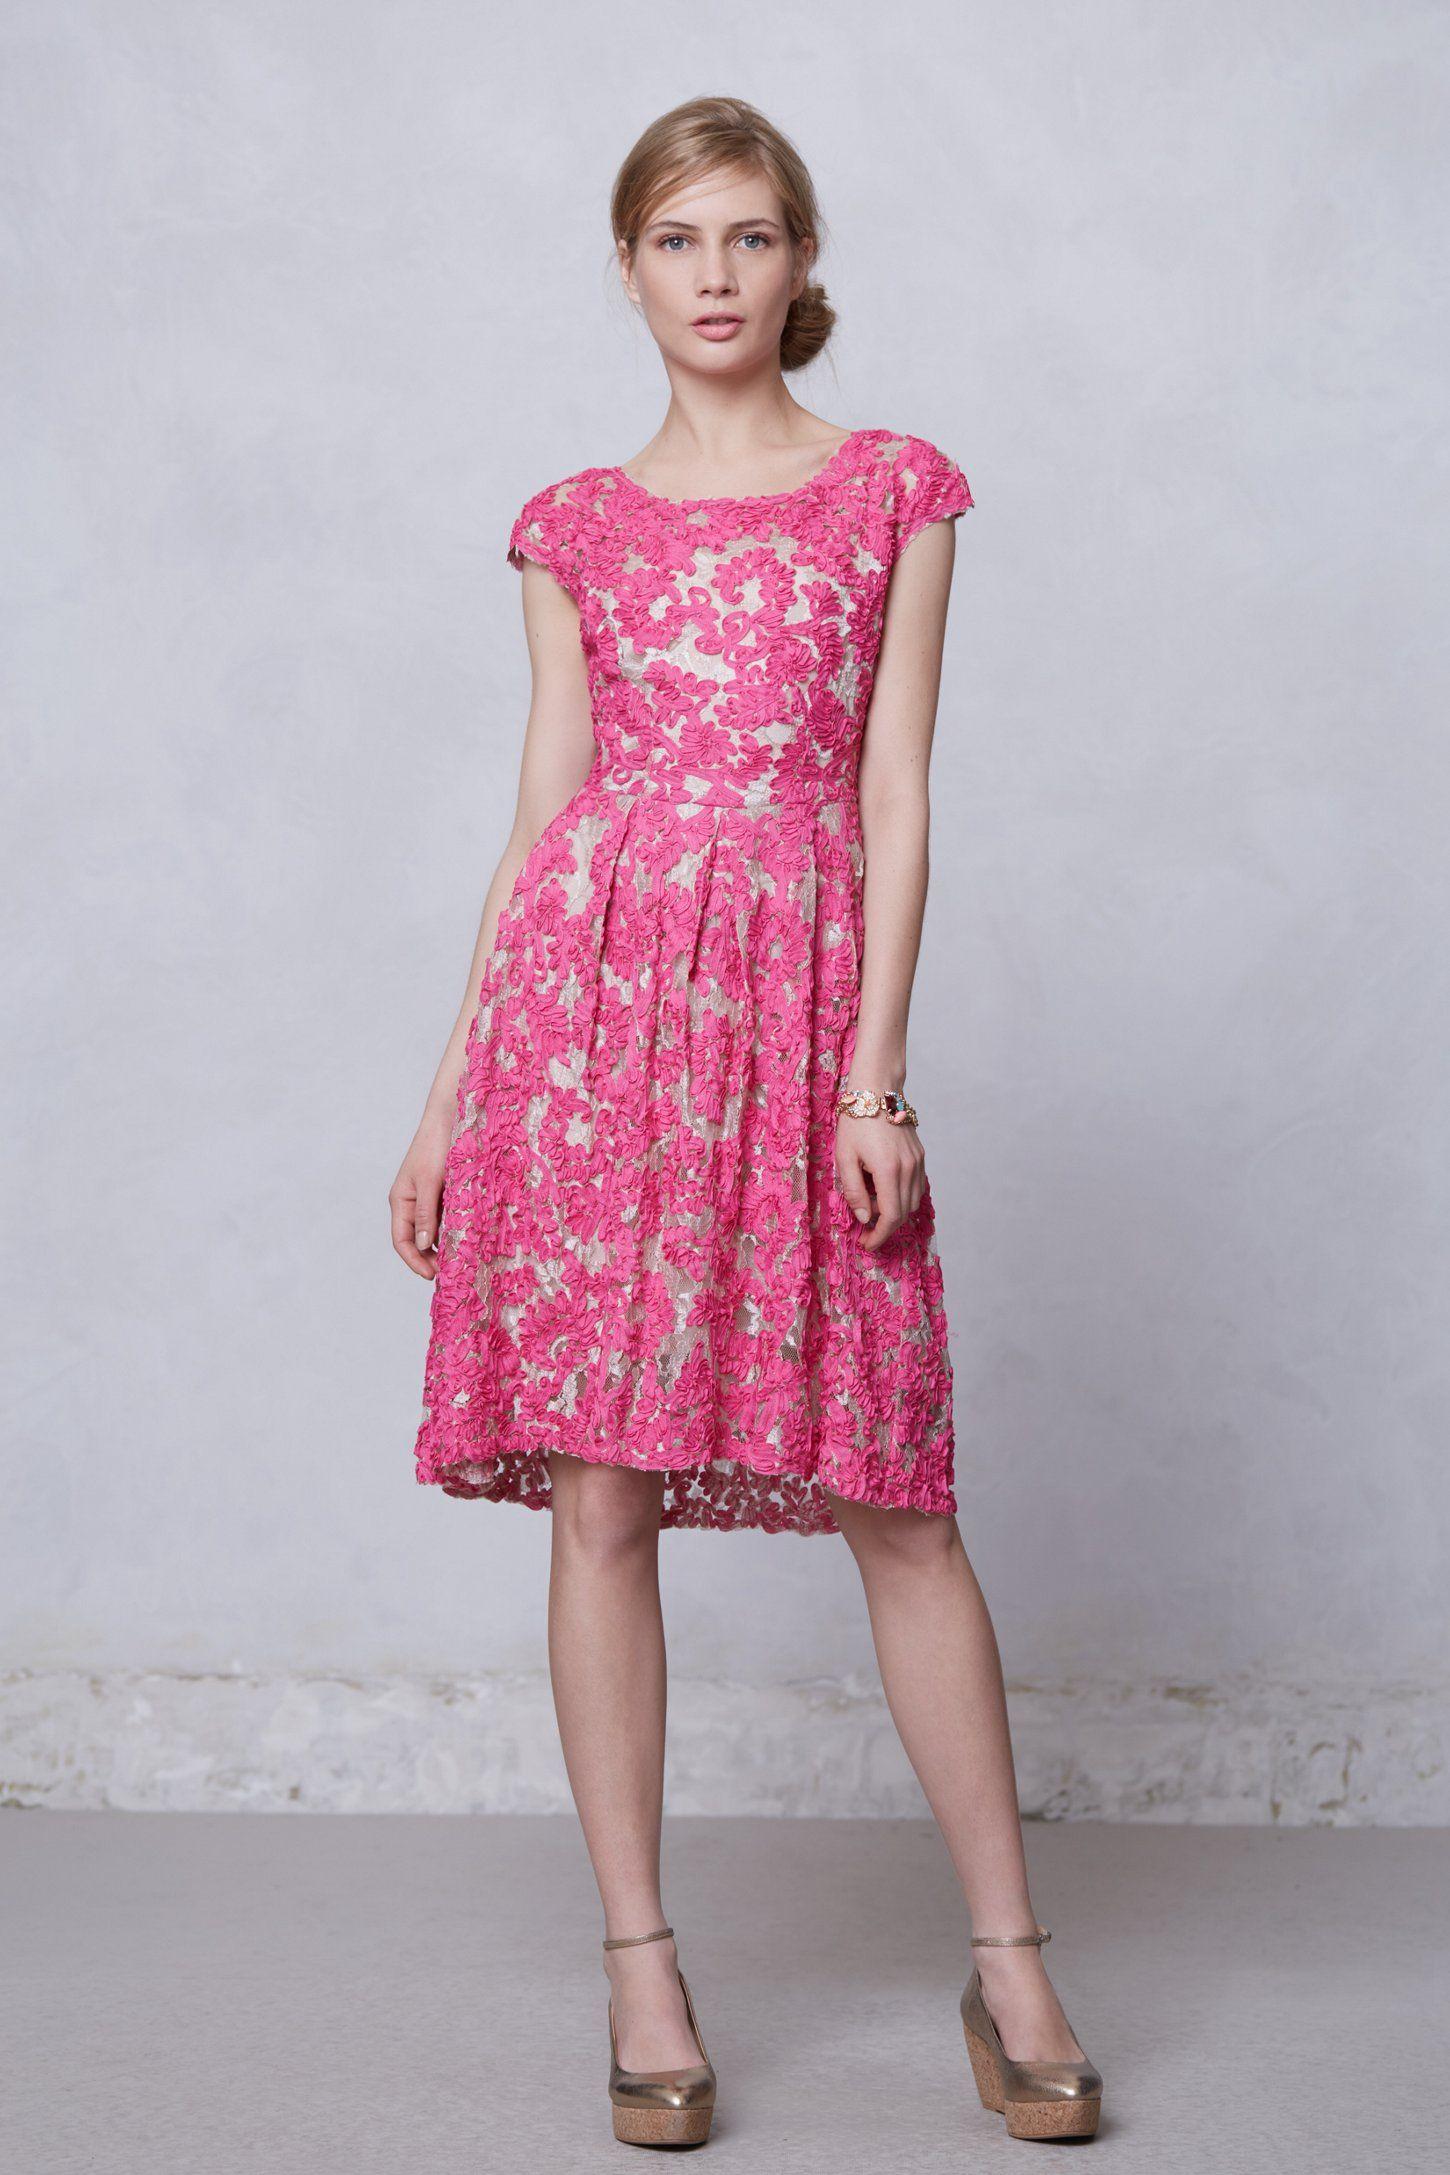 Anthropologie - Jardim Lace Dress | Frock Me | Pinterest ...